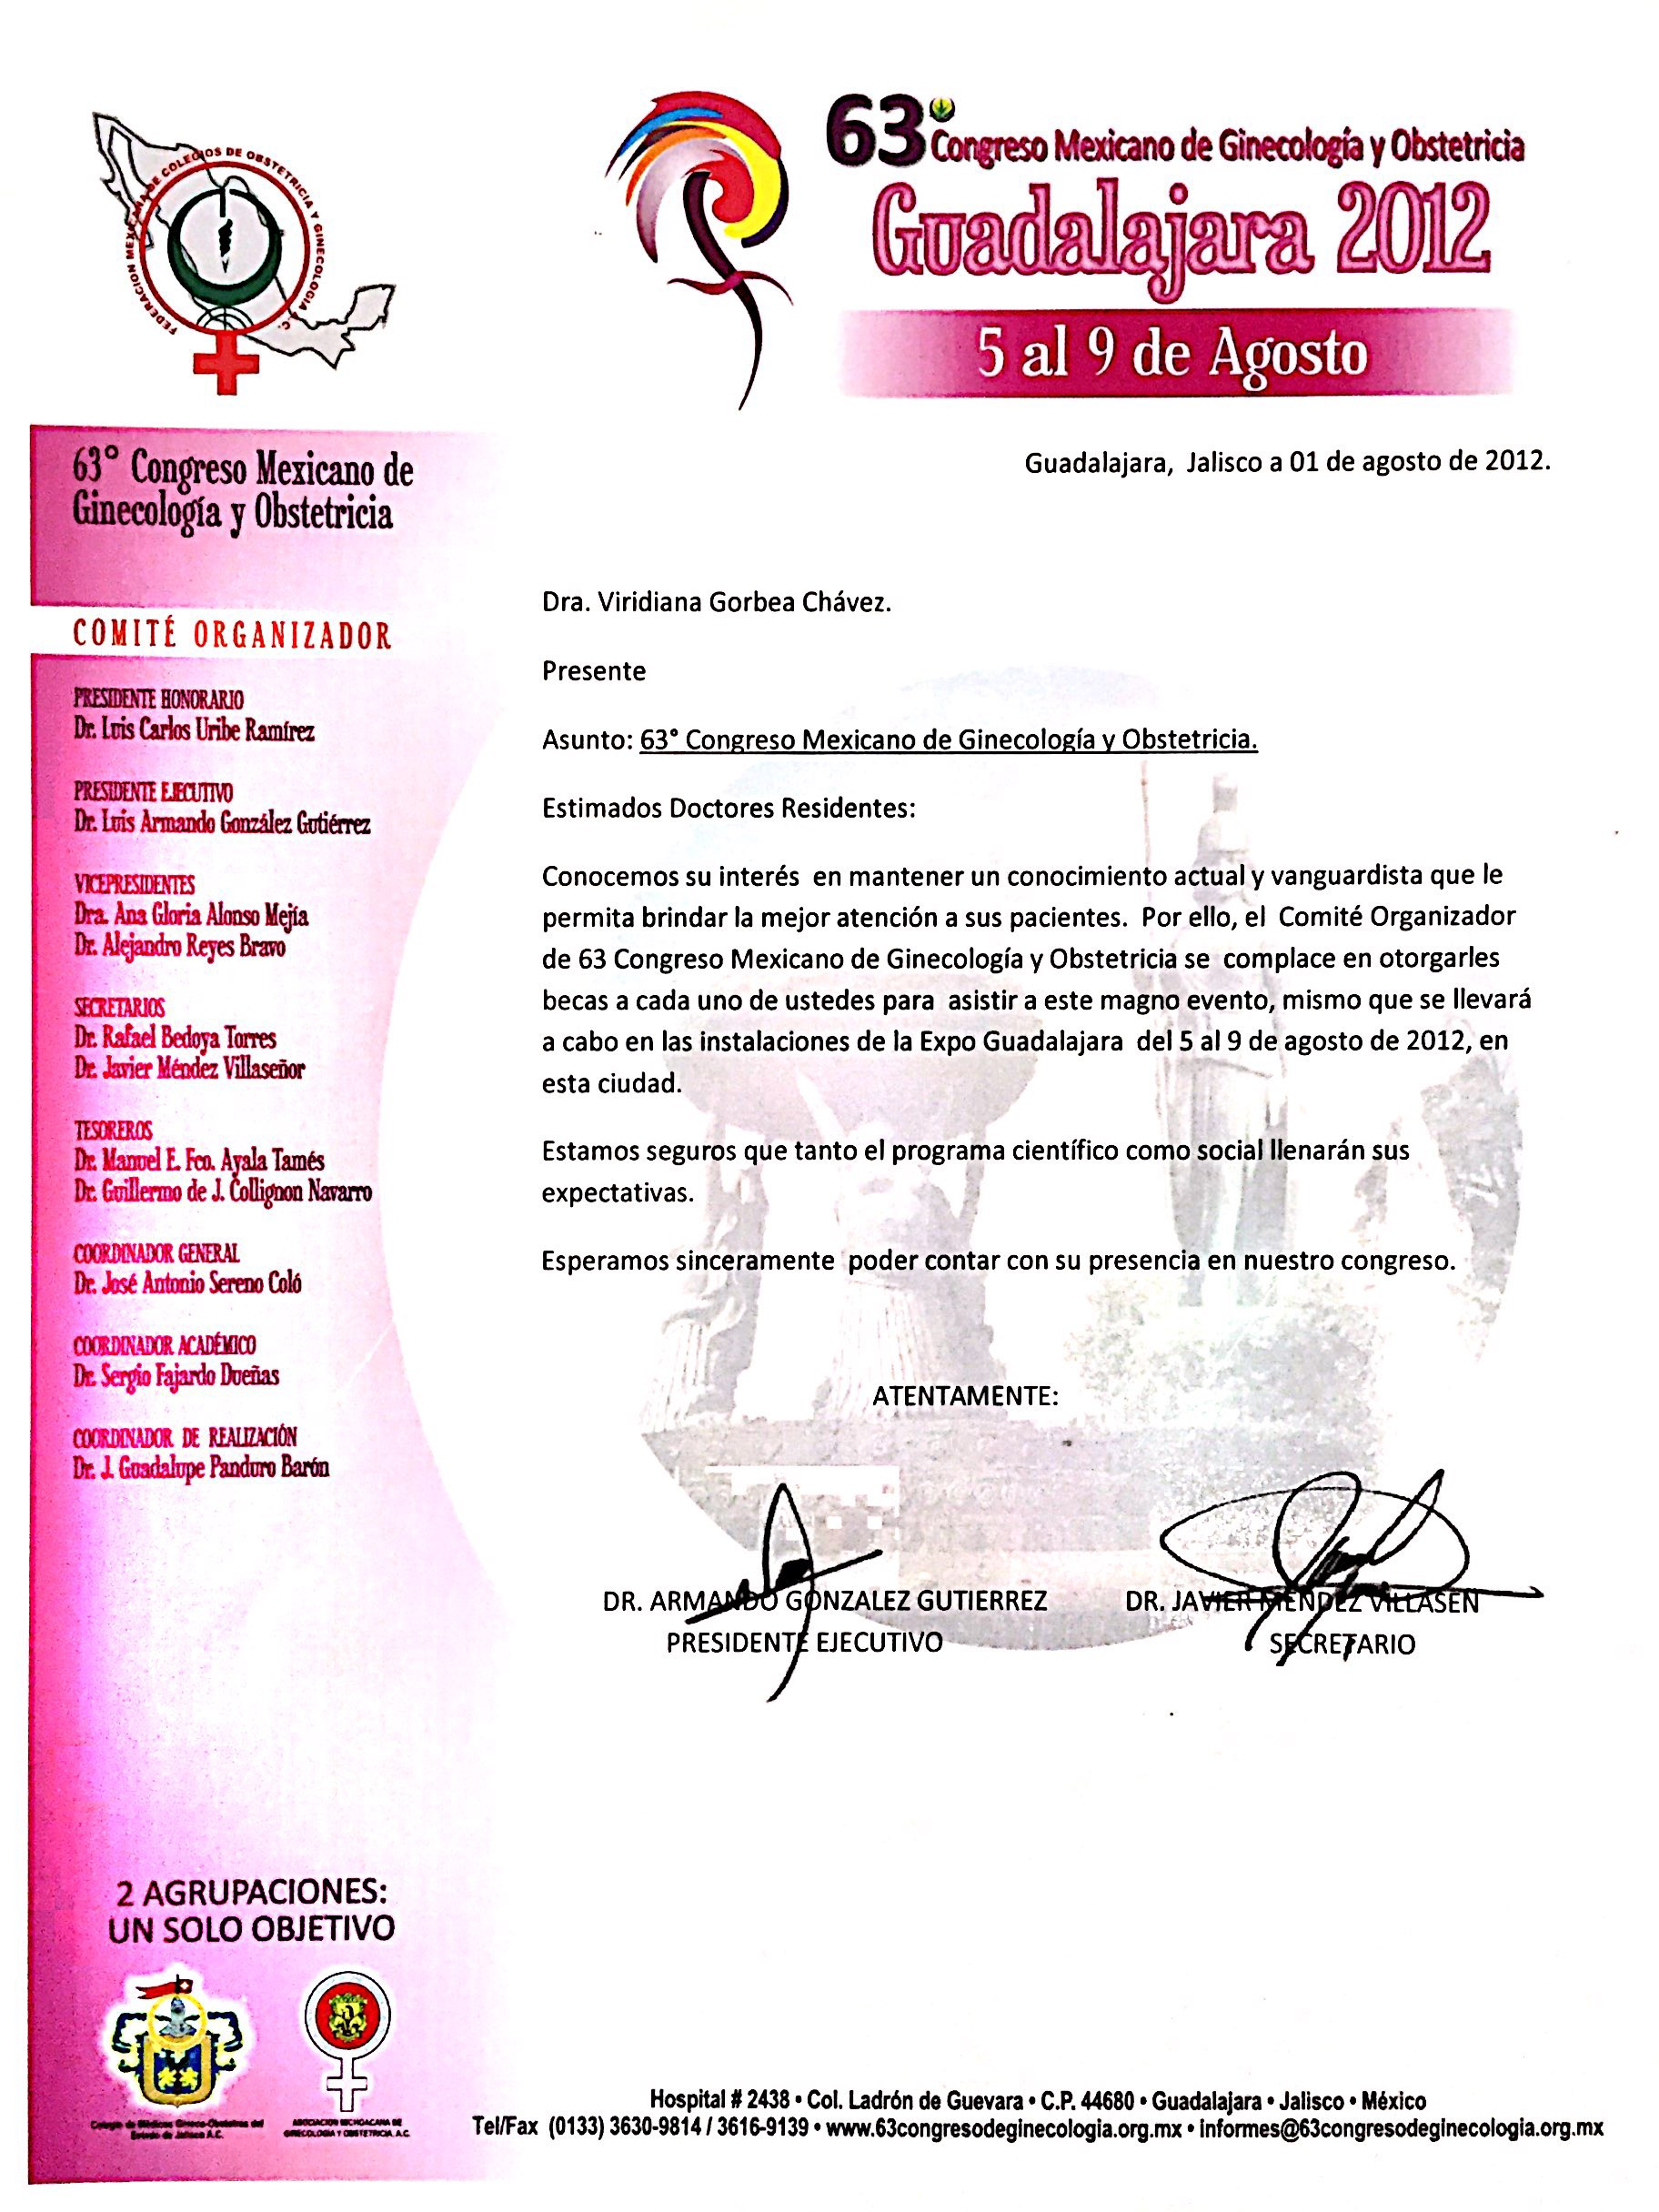 Nuevo doc 2018-02-20 11.21.39_19